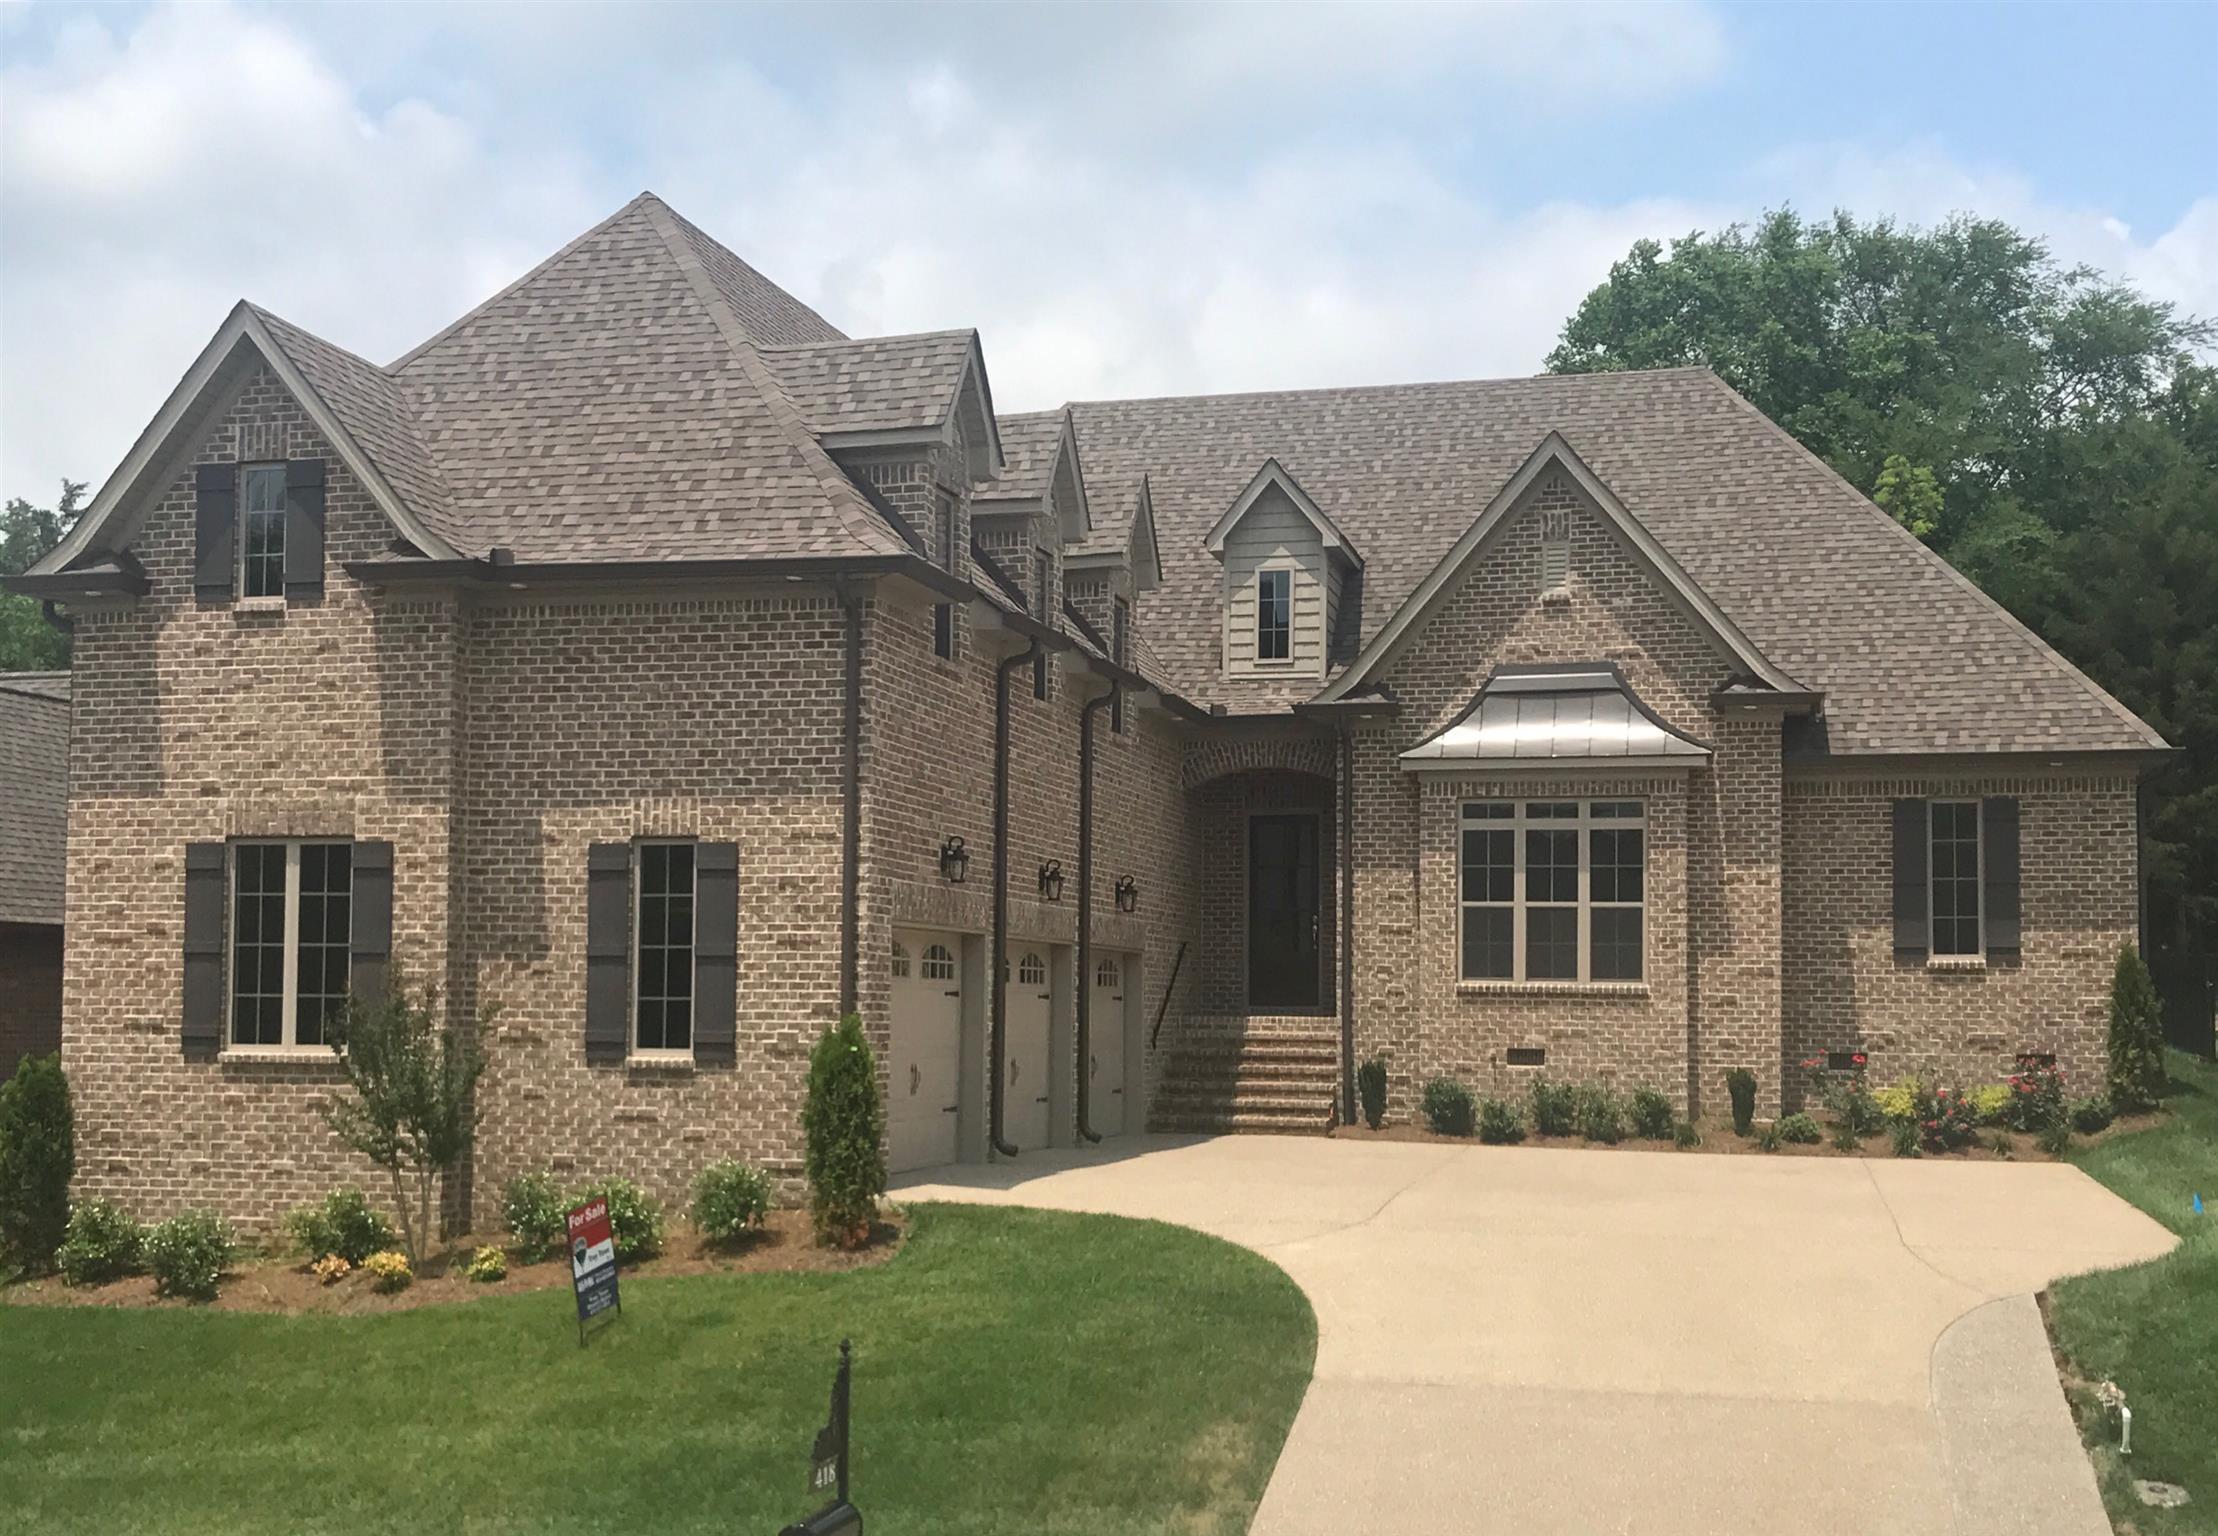 418 Archer Way West, Hendersonville, TN 37075 - Hendersonville, TN real estate listing